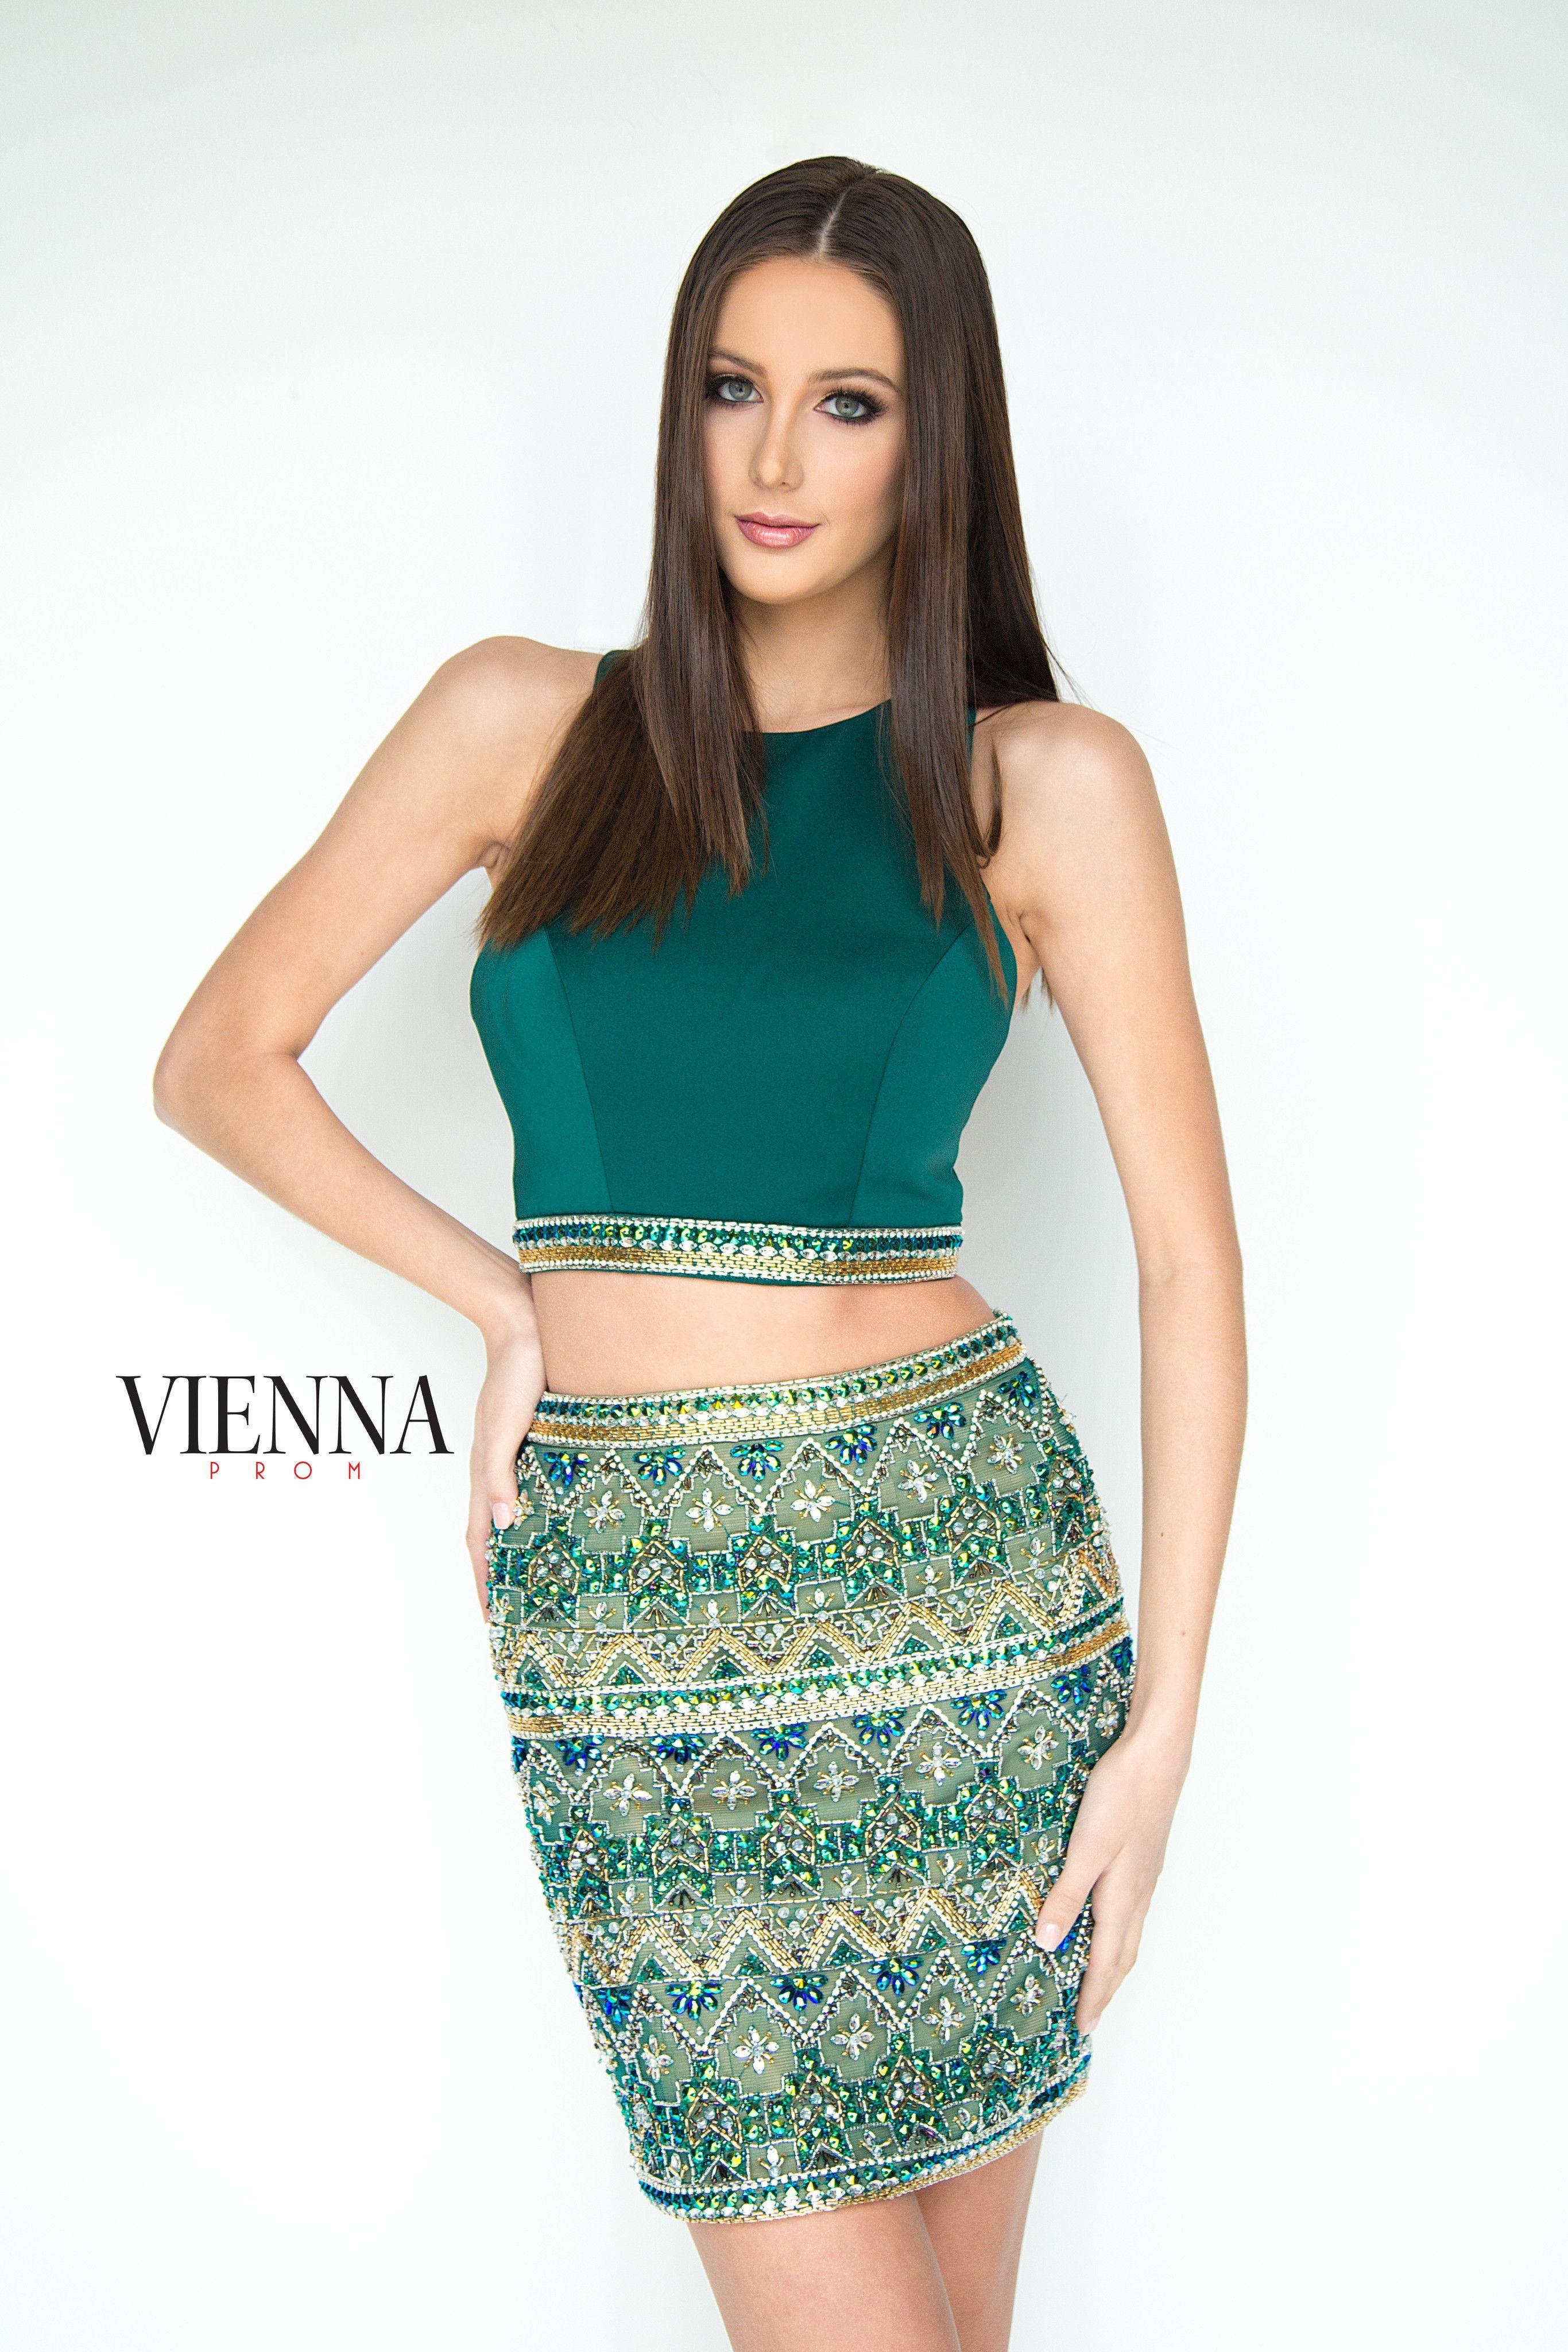 Vienna Prom 6087 Emerald Beaded Two Piece Short Dress Two Piece Short Dress Short Dresses Cute Dresses [ 4096 x 2731 Pixel ]